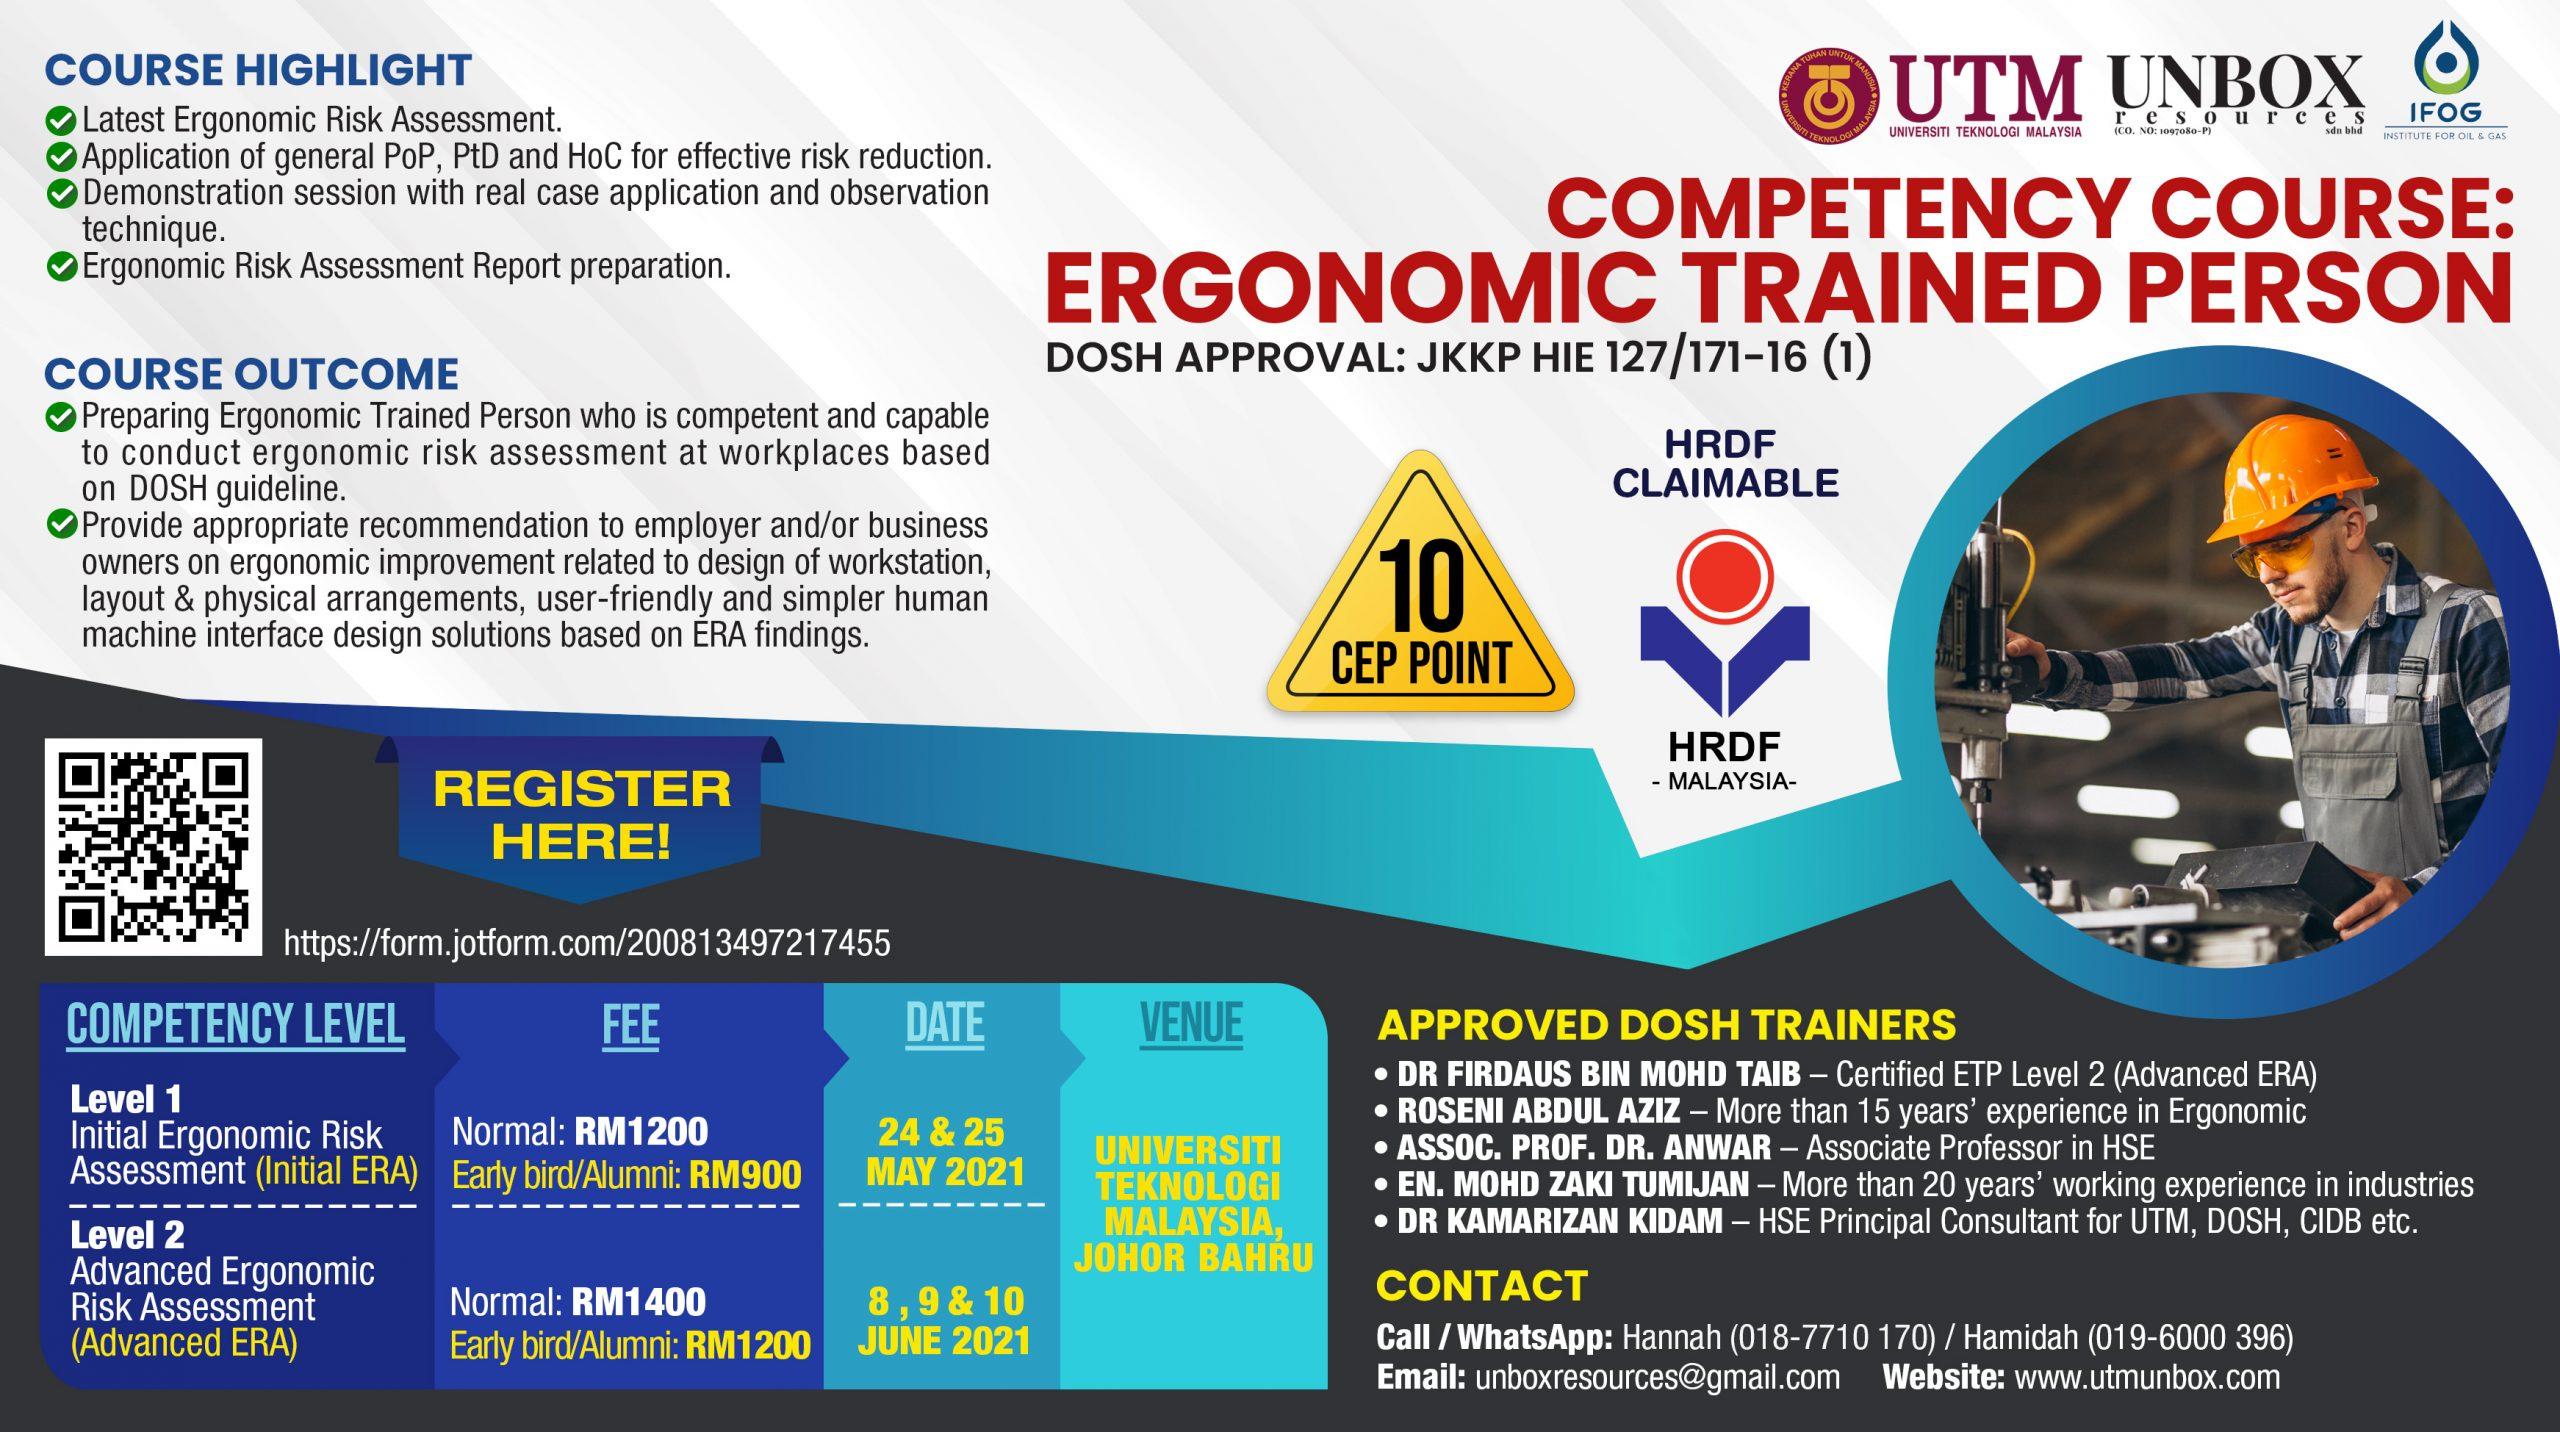 COMPETENCY COURSE: ERGONOMIC TRAINED PERSON (24 & 25 MAY 2021, UNIVERSITI  TEKNOLOGI  MALAYSIA, JOHOR BAHRU)